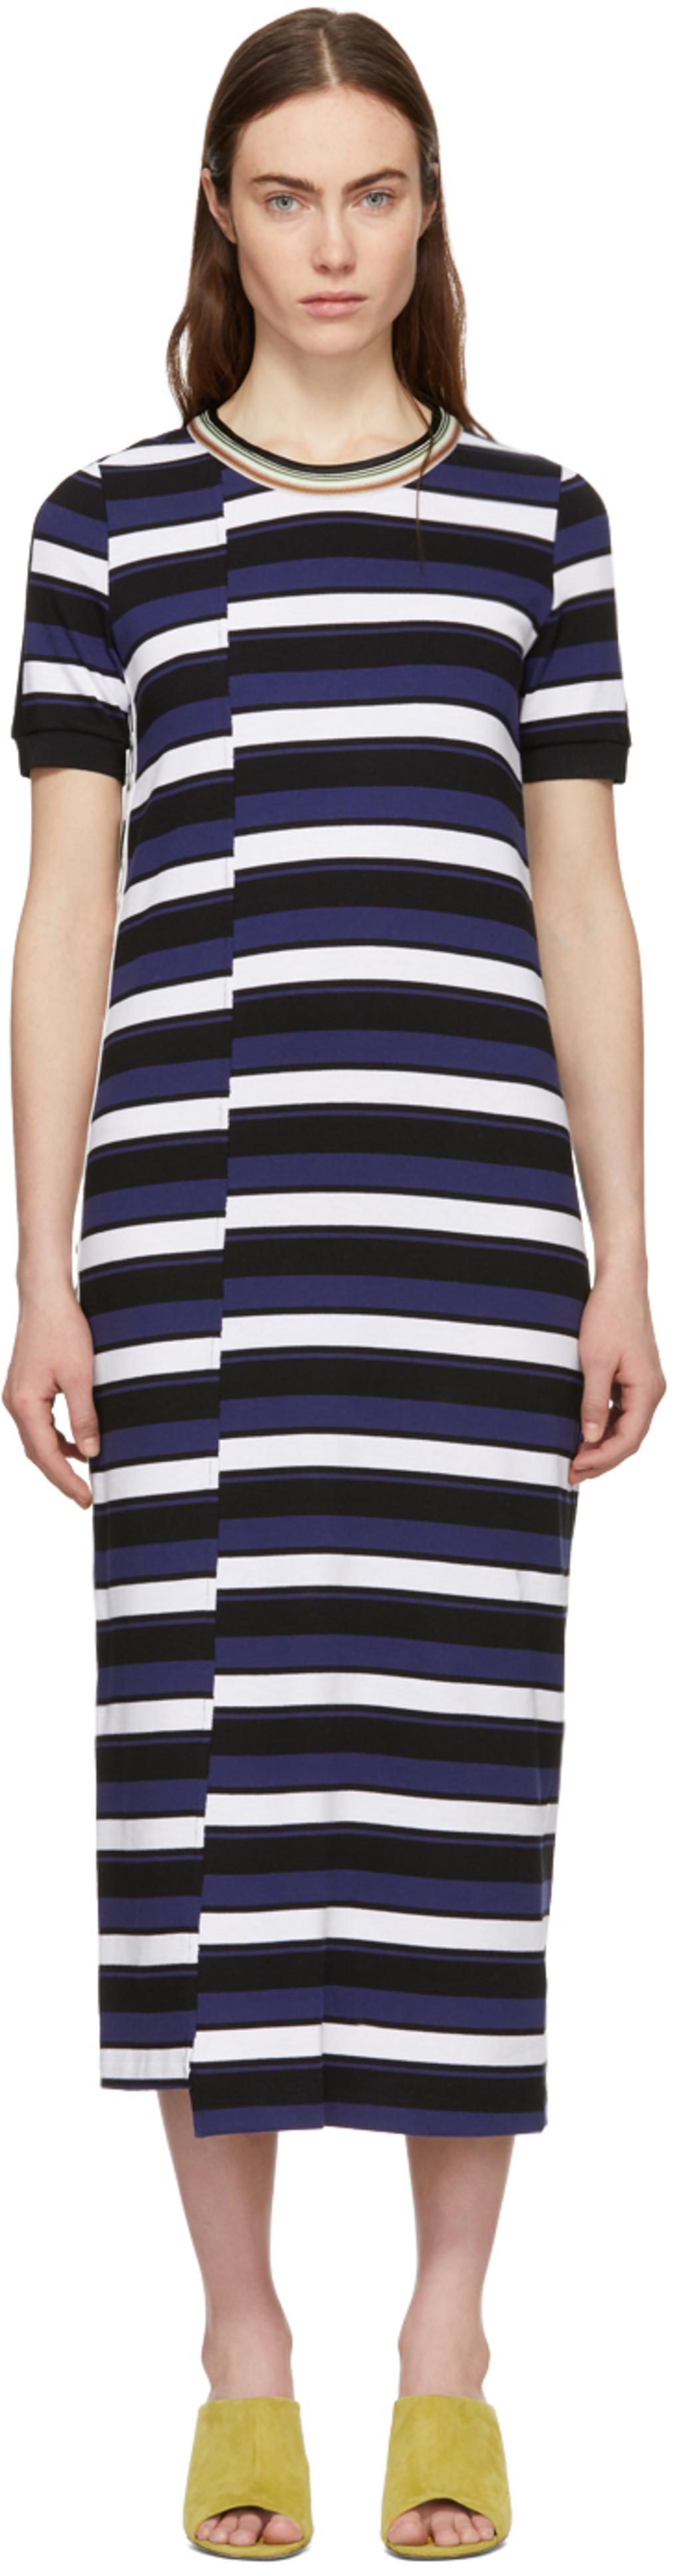 DRESSES - Short dresses 3.1 Phillip Lim